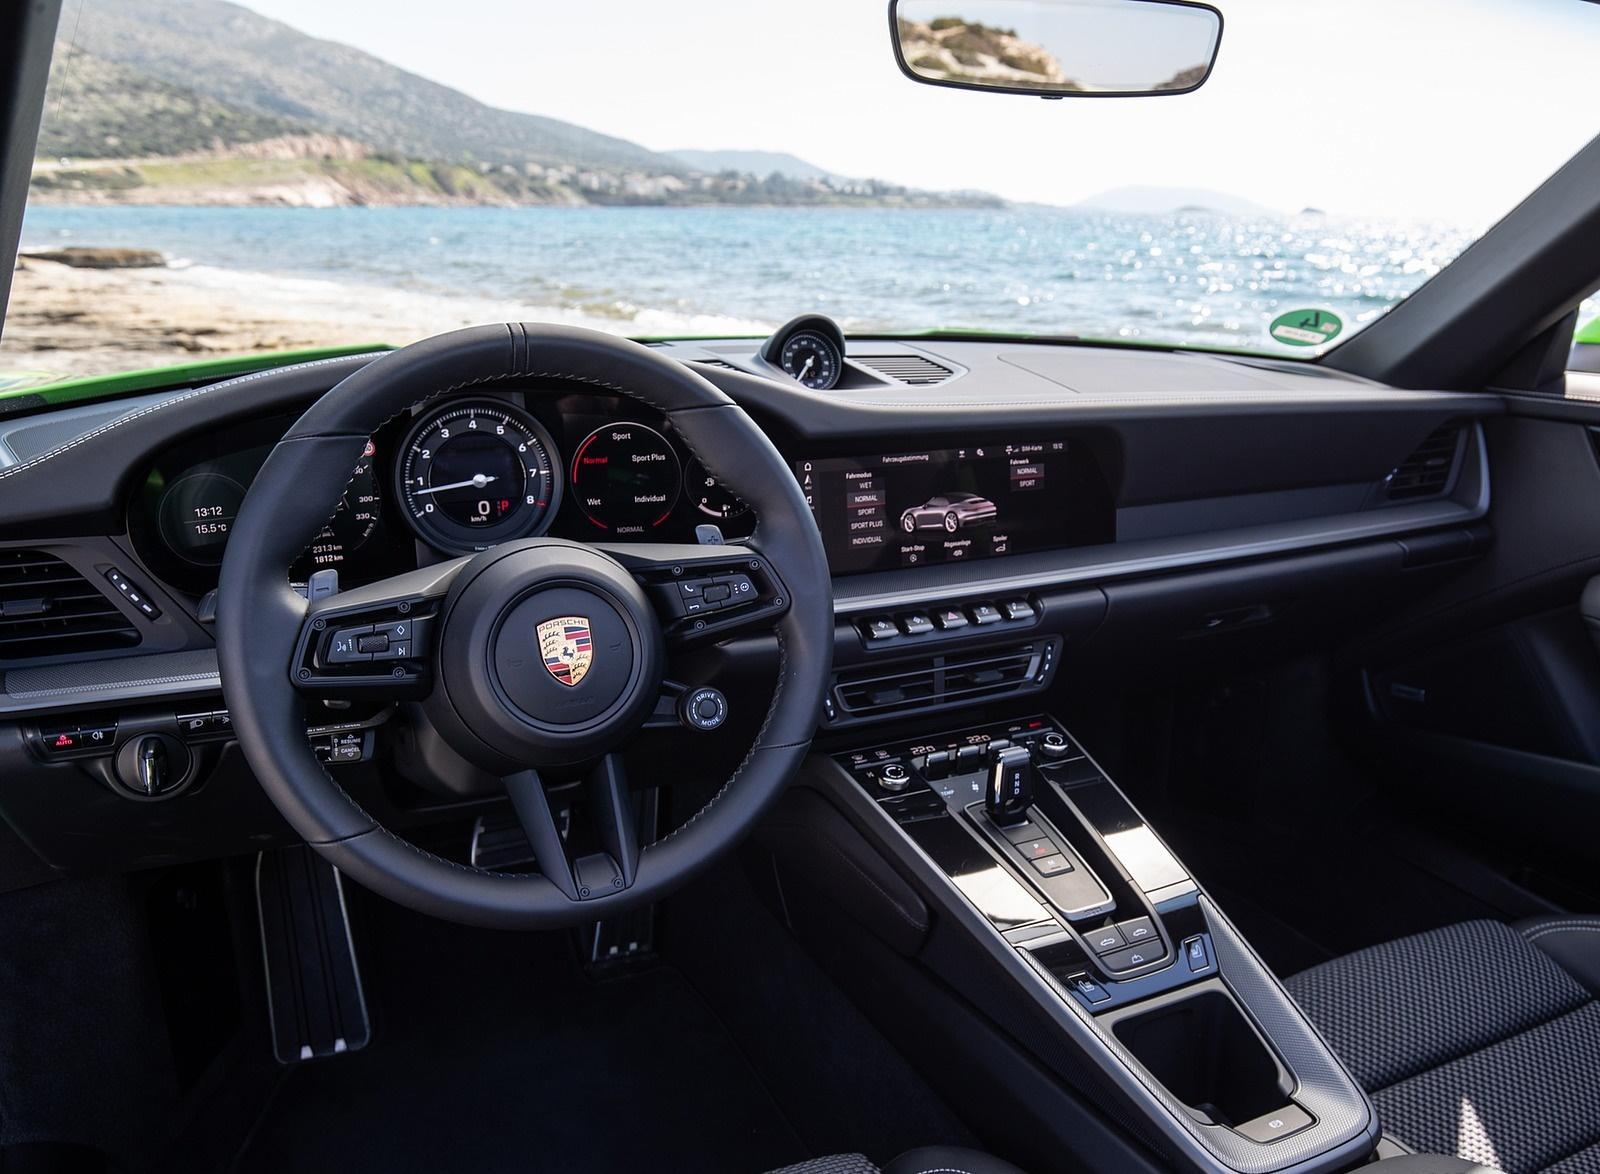 2020 Porsche 911 Carrera S Cabriolet Color Lizard Green 1600x1174